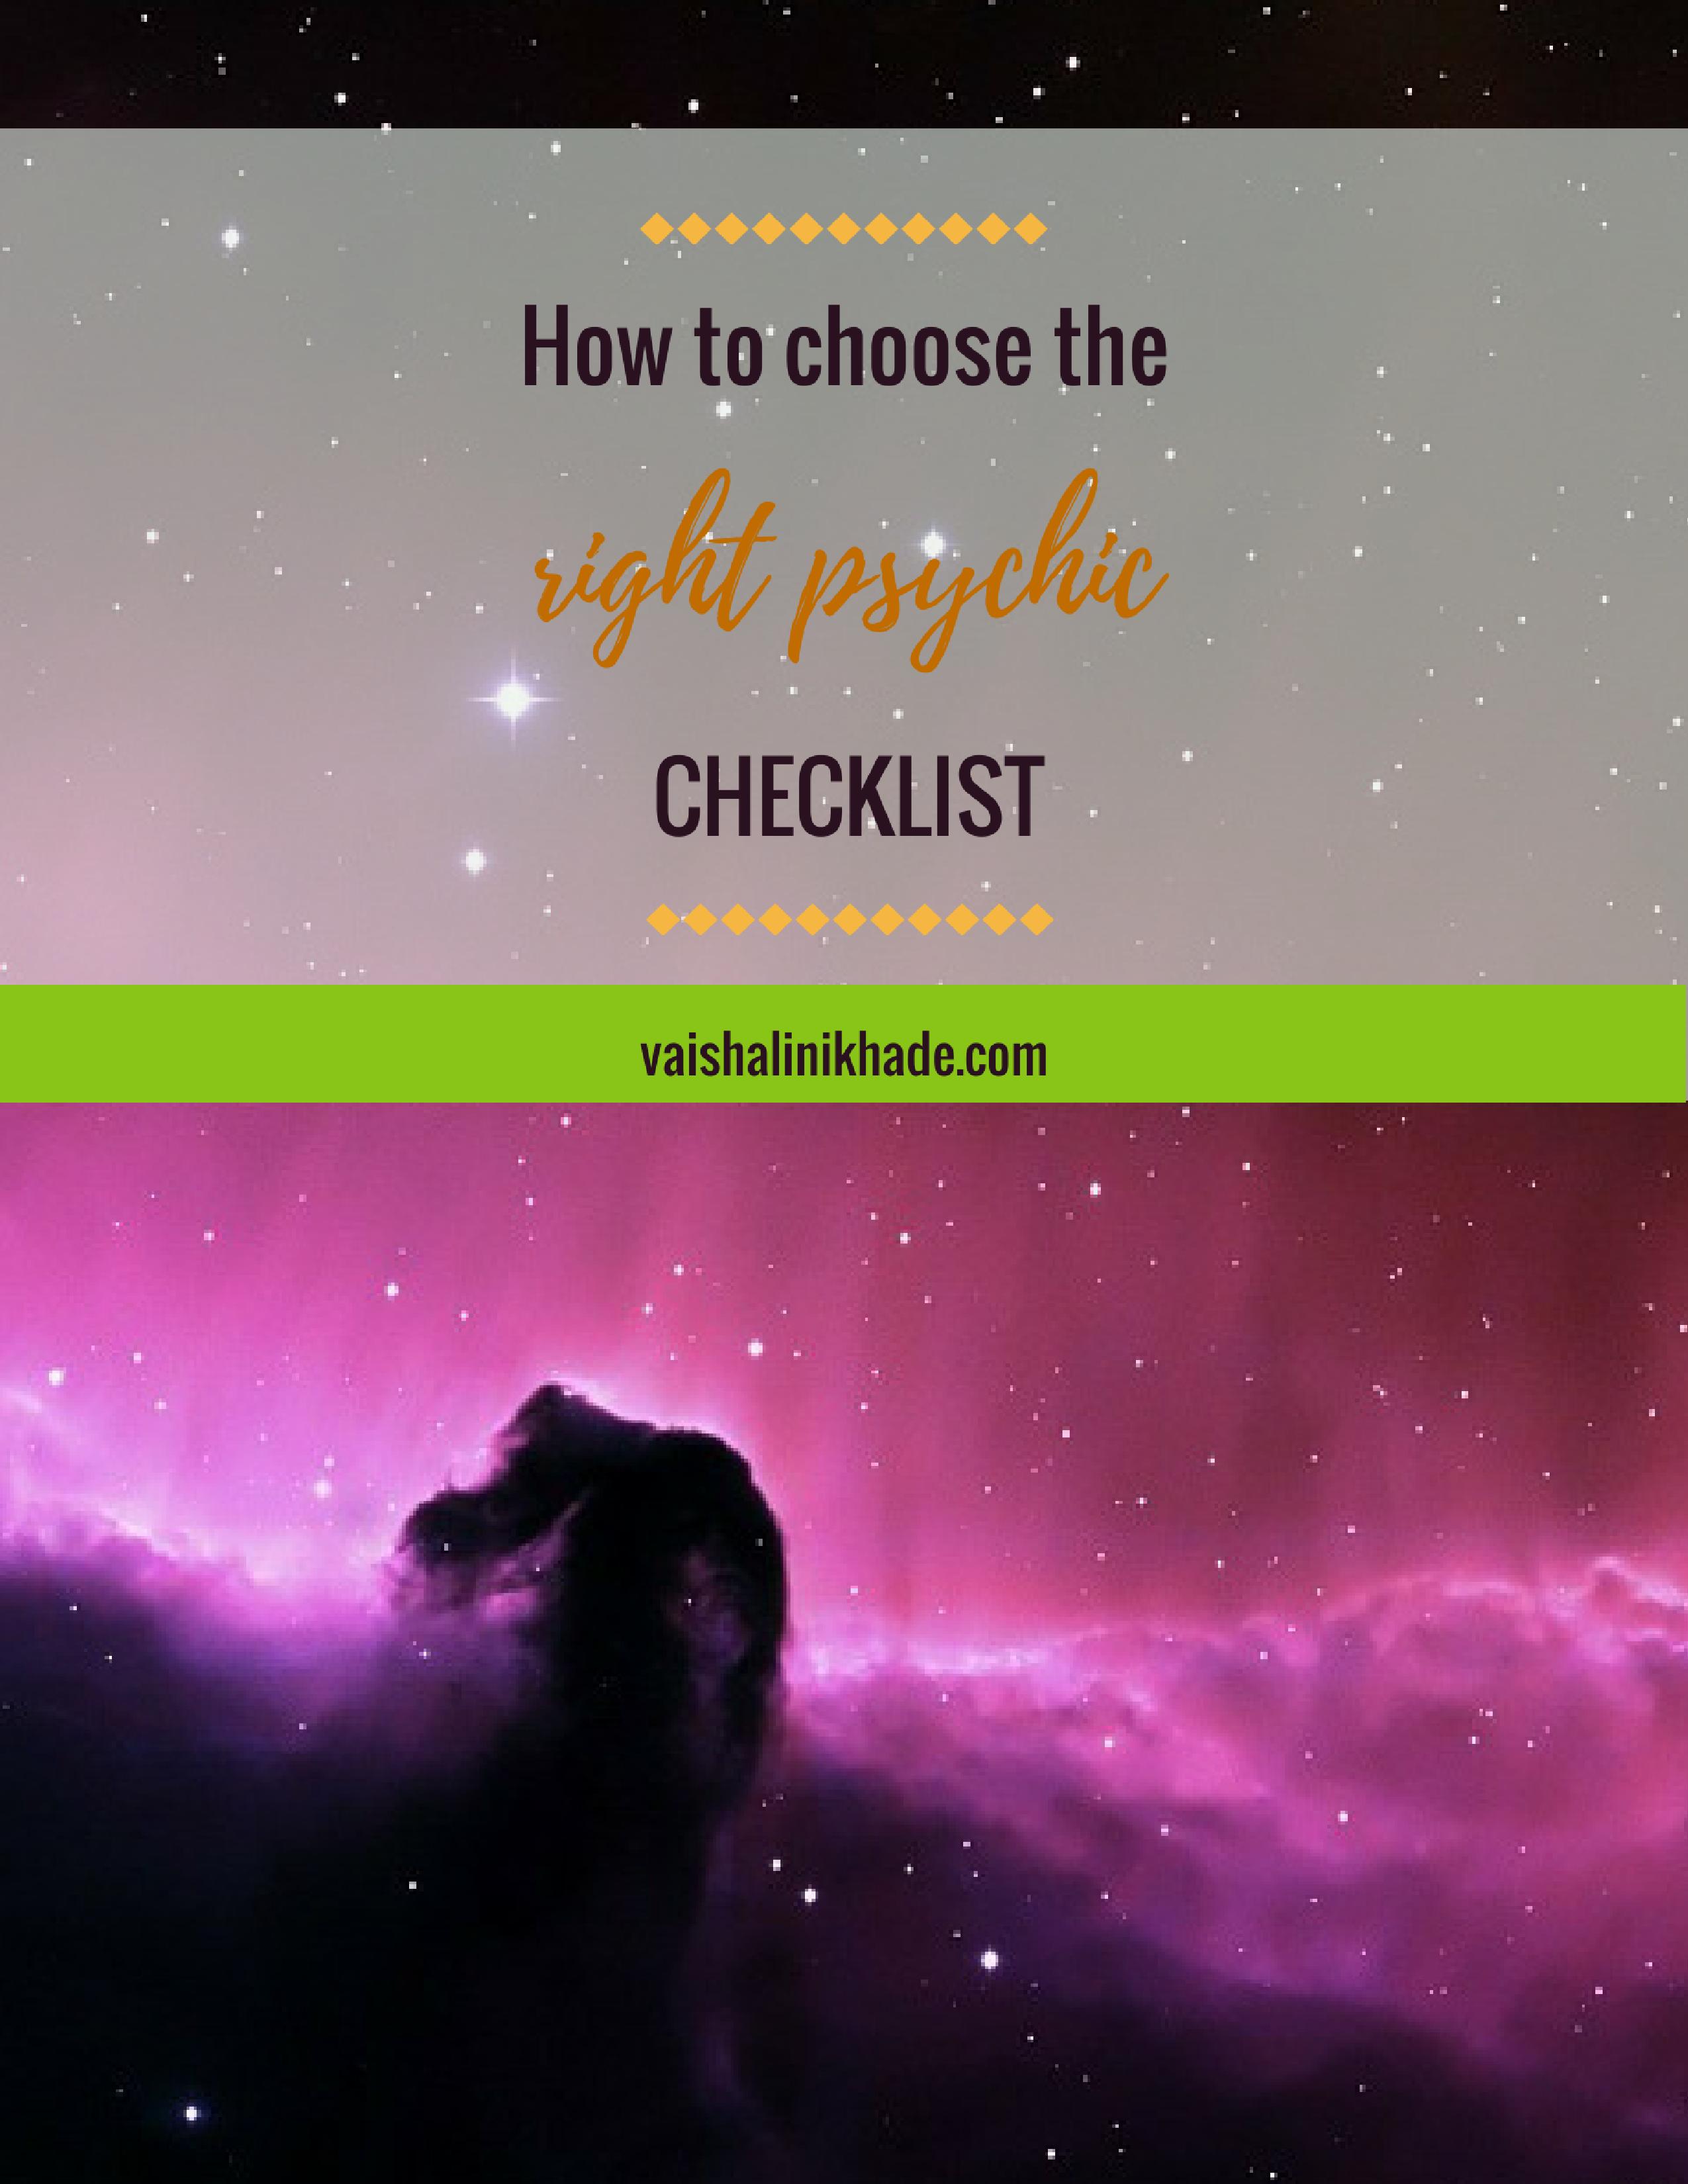 right-psychic-checklist